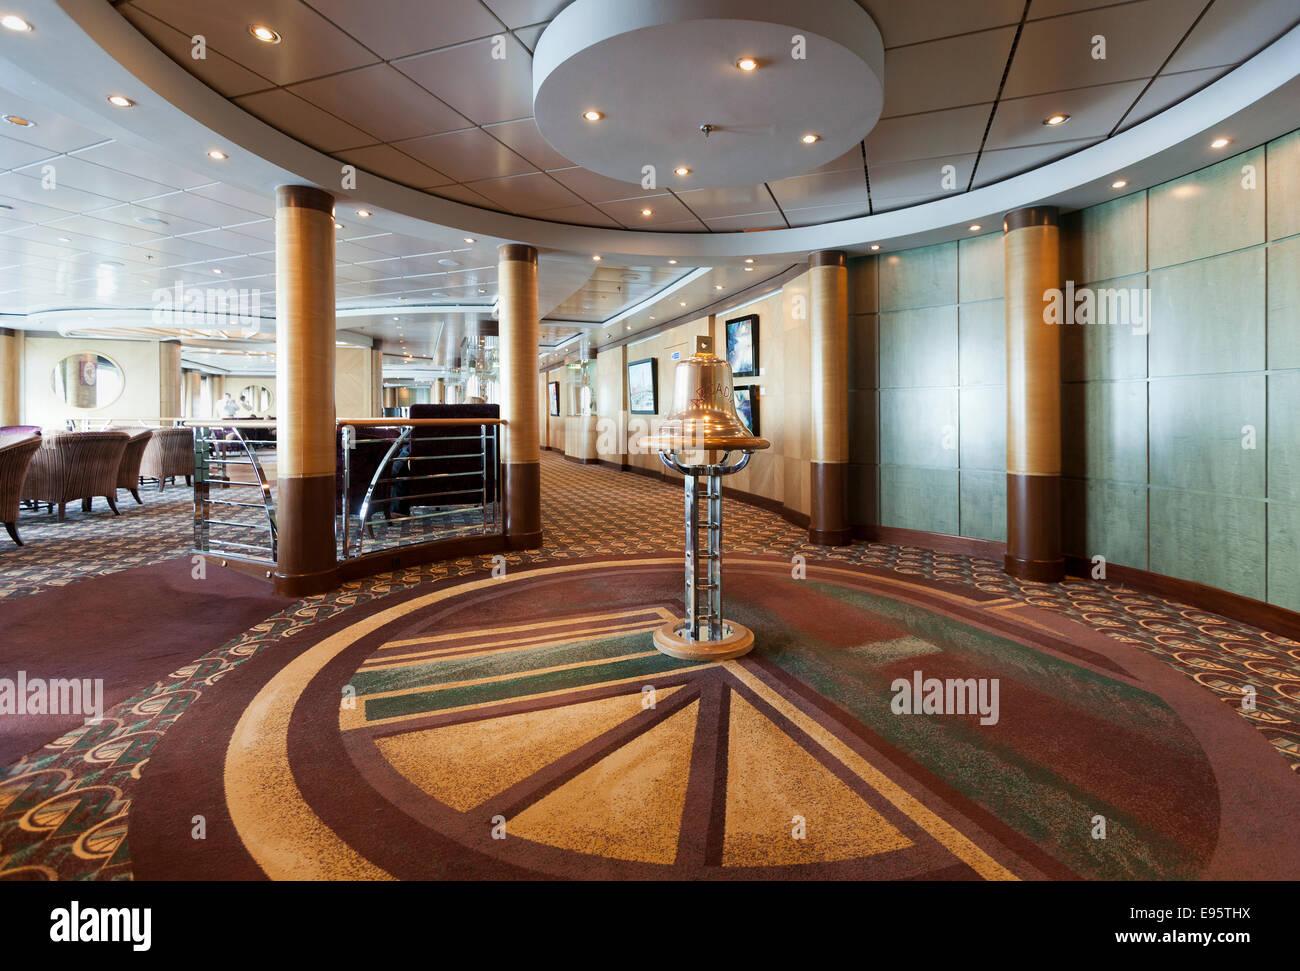 Interior of arcadia the p o cruise ship stock photo for Aurora p o interior